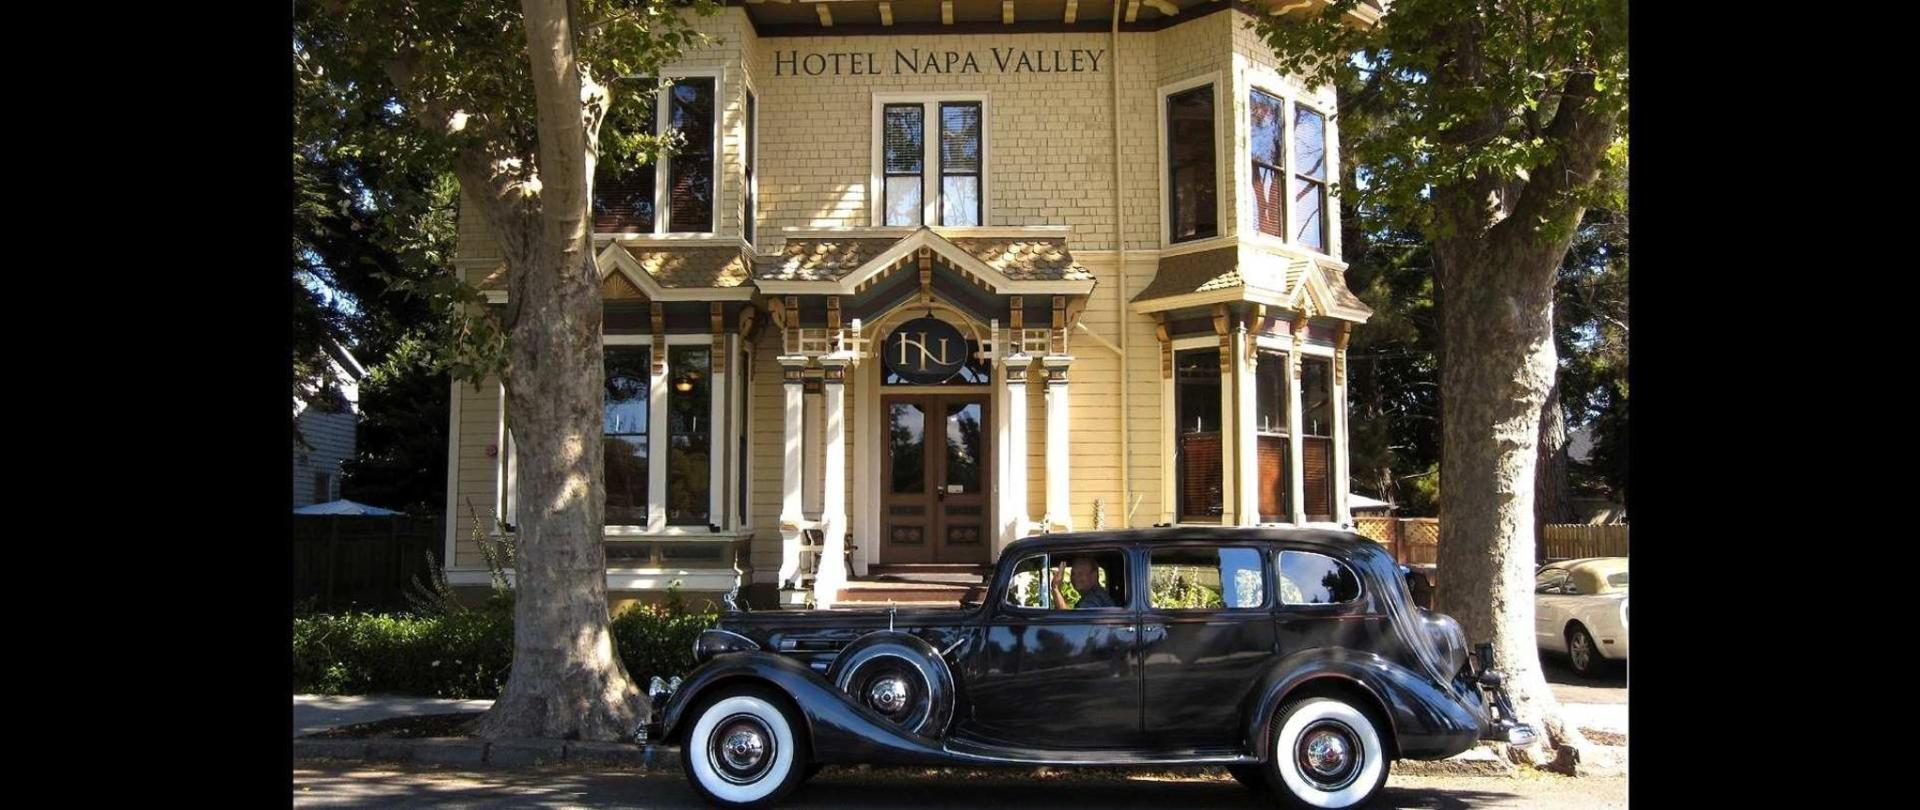 Napa Valley Hotels >> Hotel Napa Valley An Old World Inn Napa Ca United States